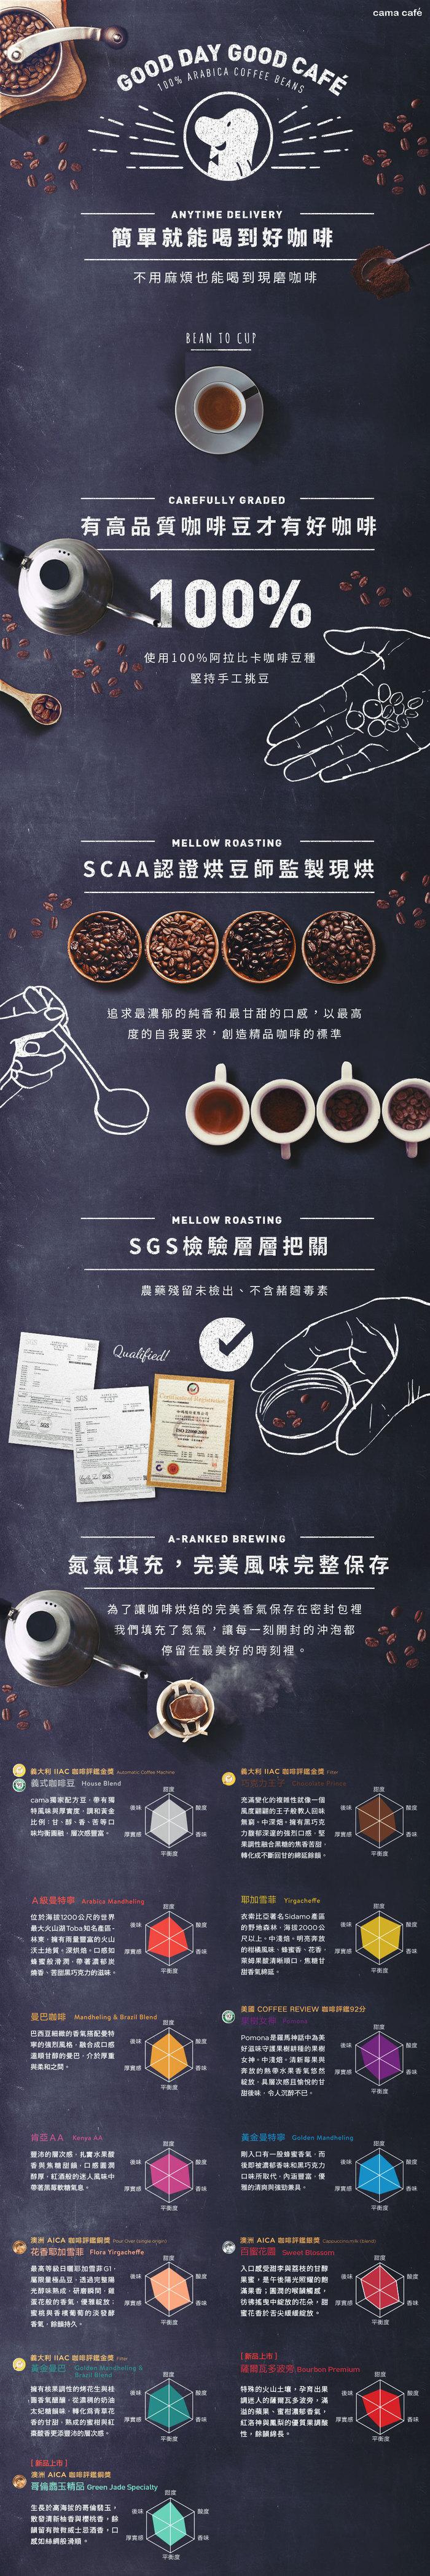 cama cafe|花香耶加雪菲咖啡豆(250g/1包)